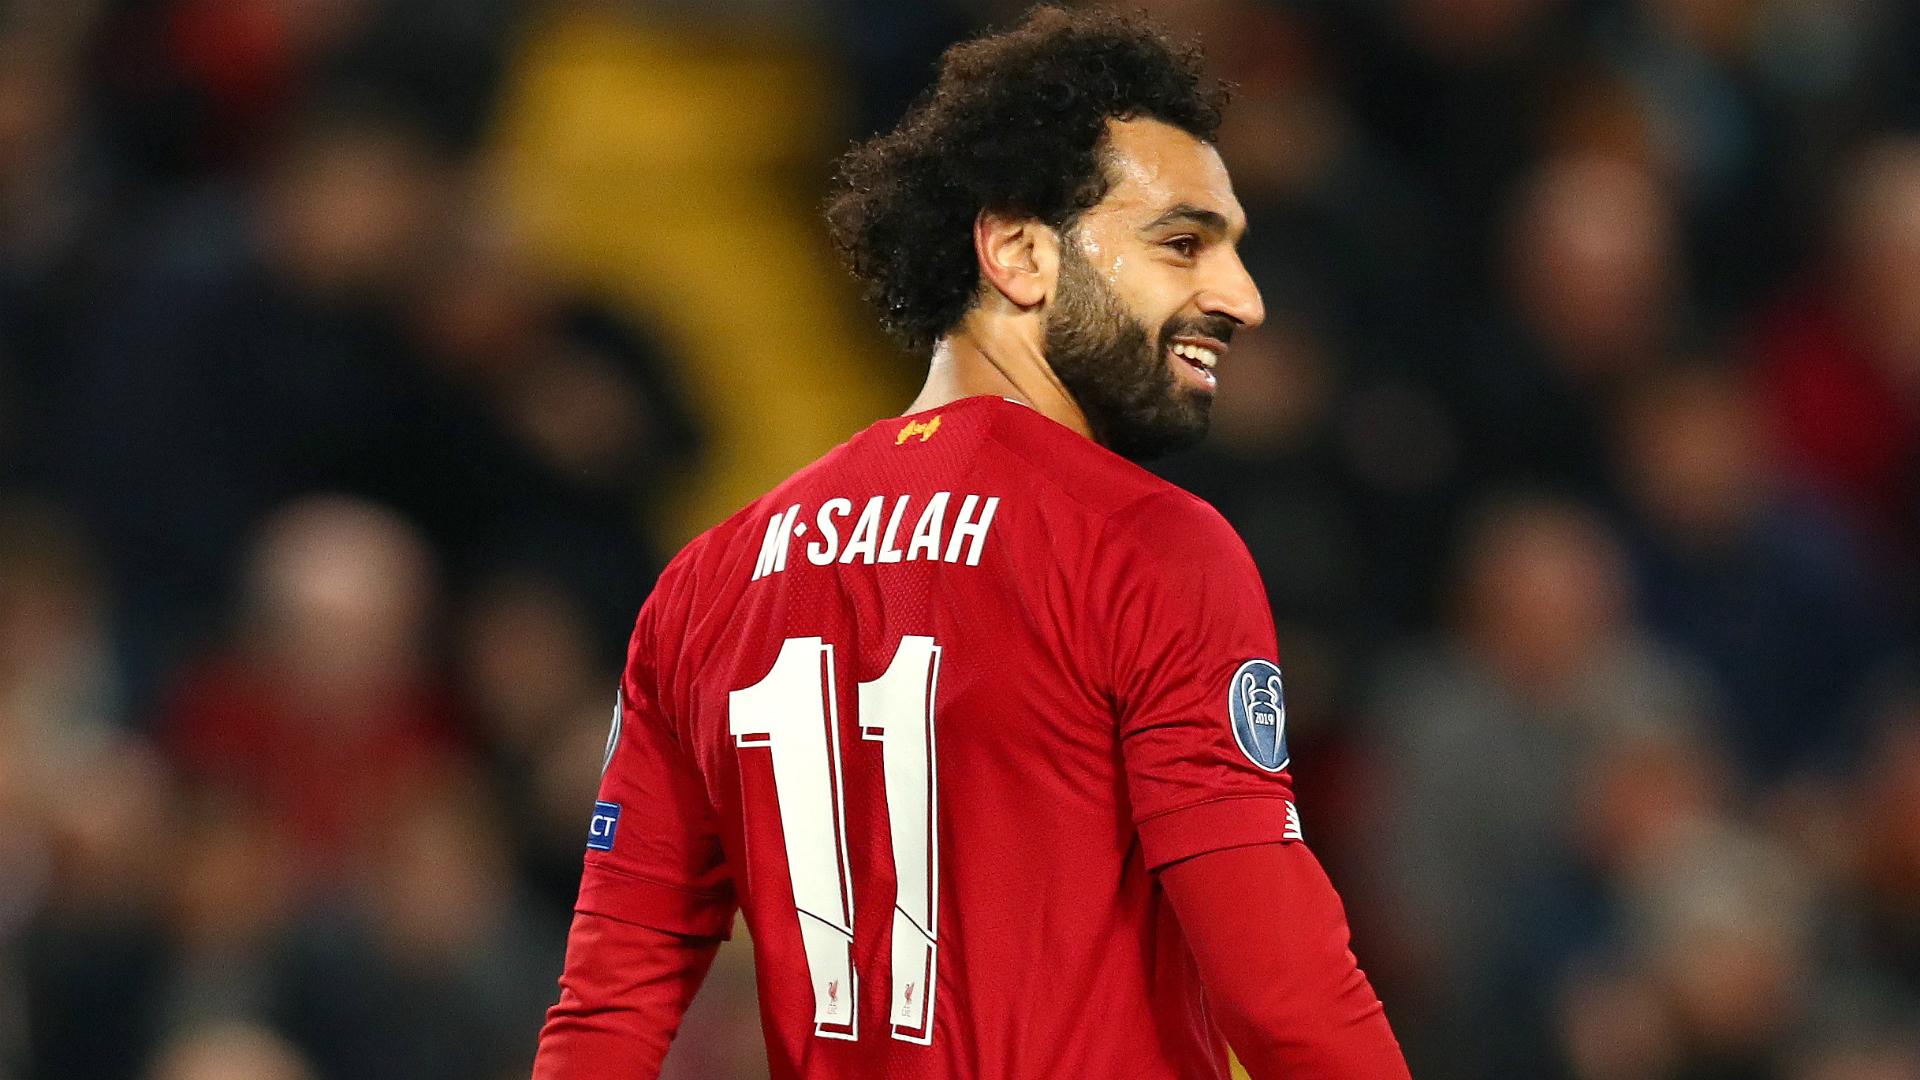 Salah back in Liverpool training ahead of Genk clash